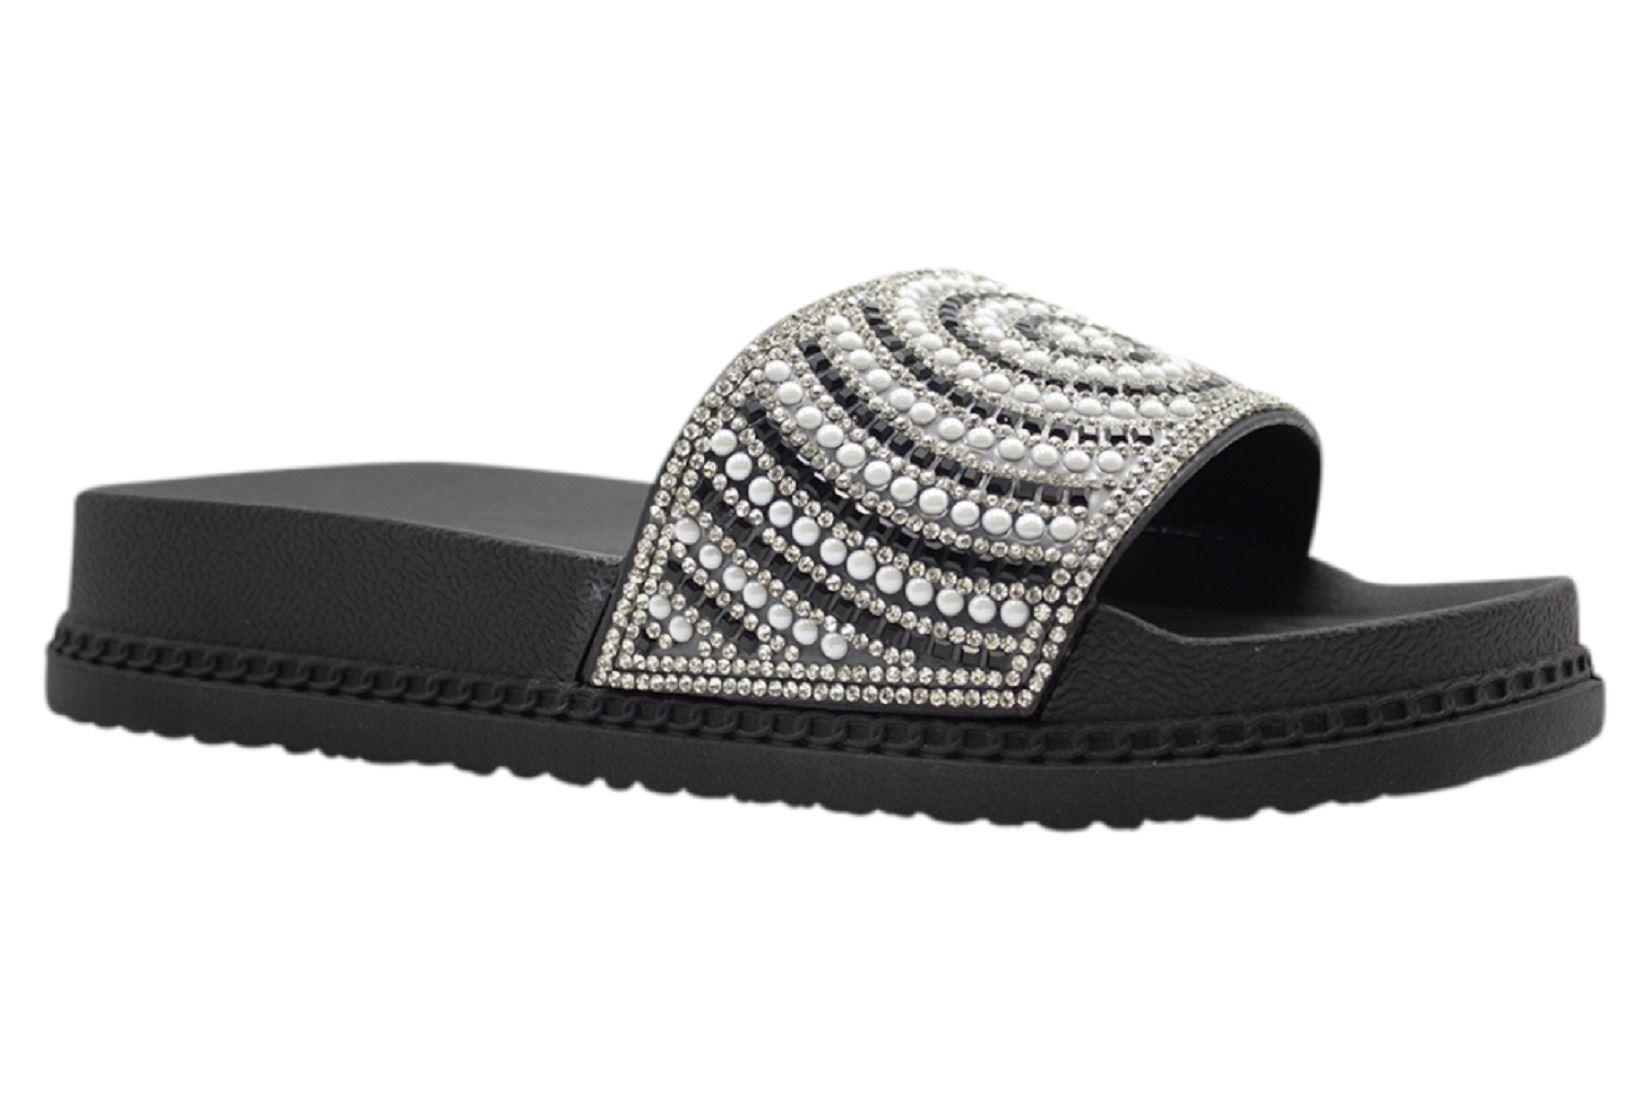 Womens-Sliders-Casual-Slippers-Mules-Ladies-Diamante-Flip-Flop-Sandals-Shoes thumbnail 103